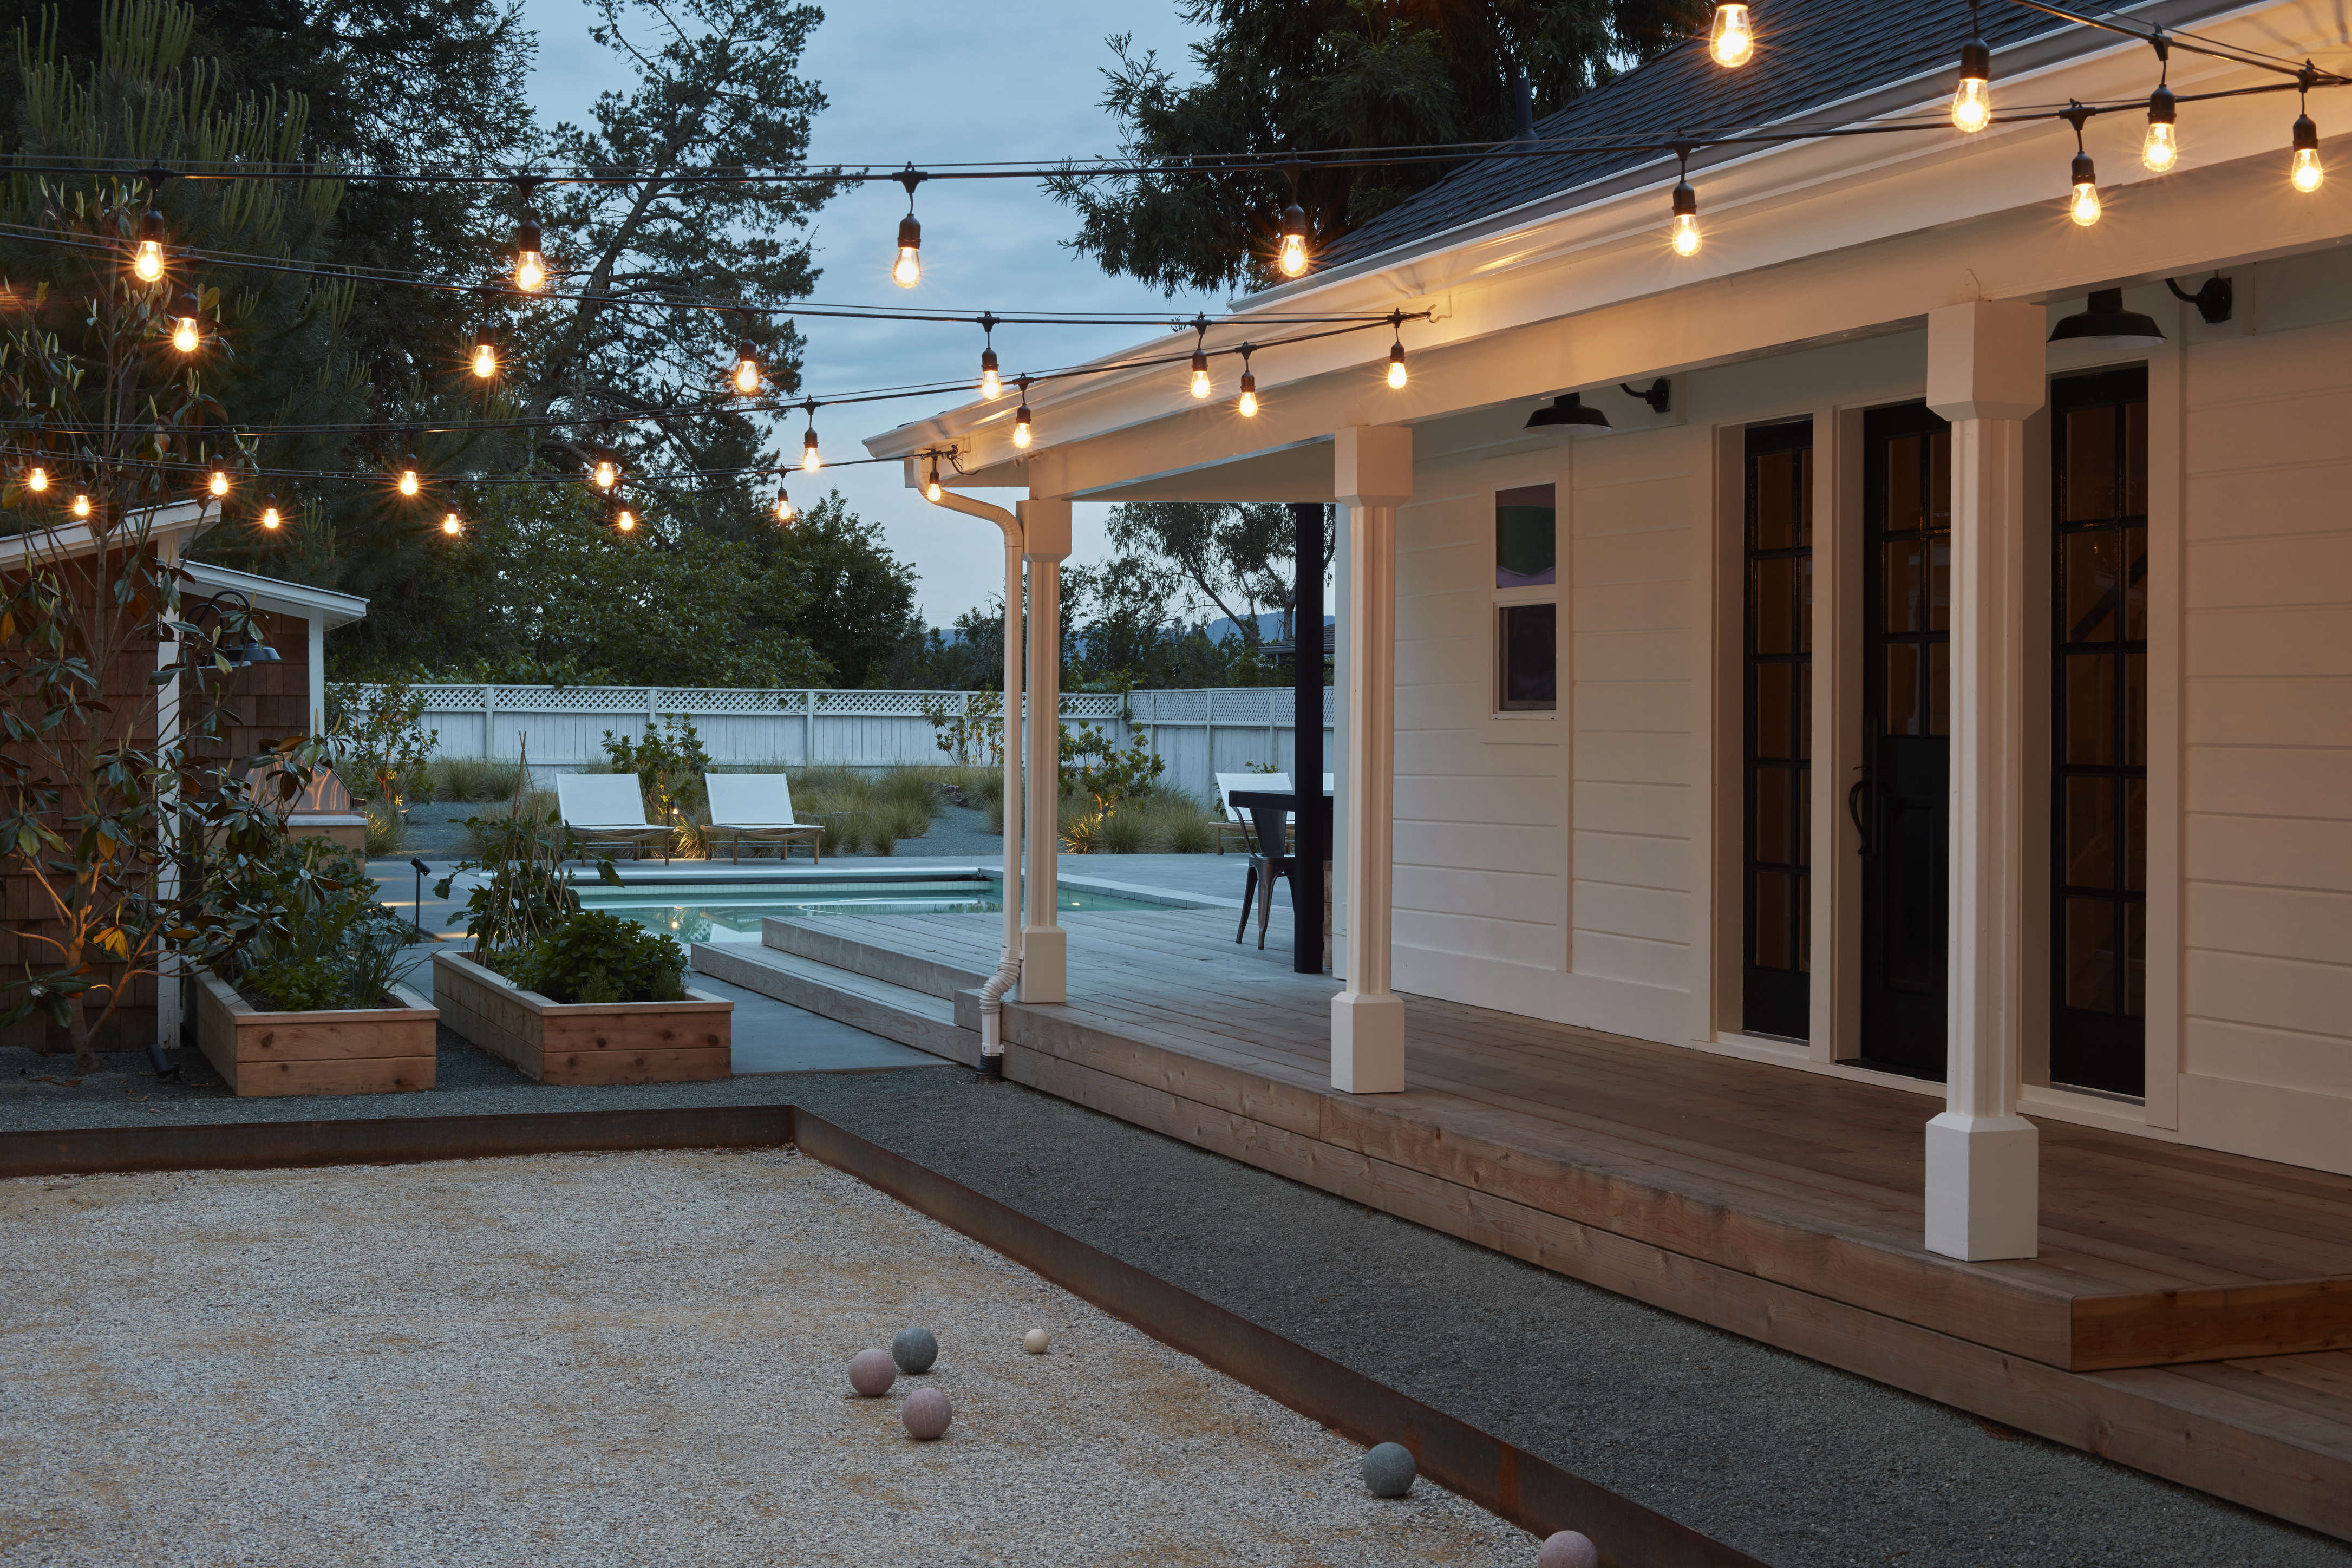 Landscape Architect Visit Terremoto Creates Serenity in Sonoma